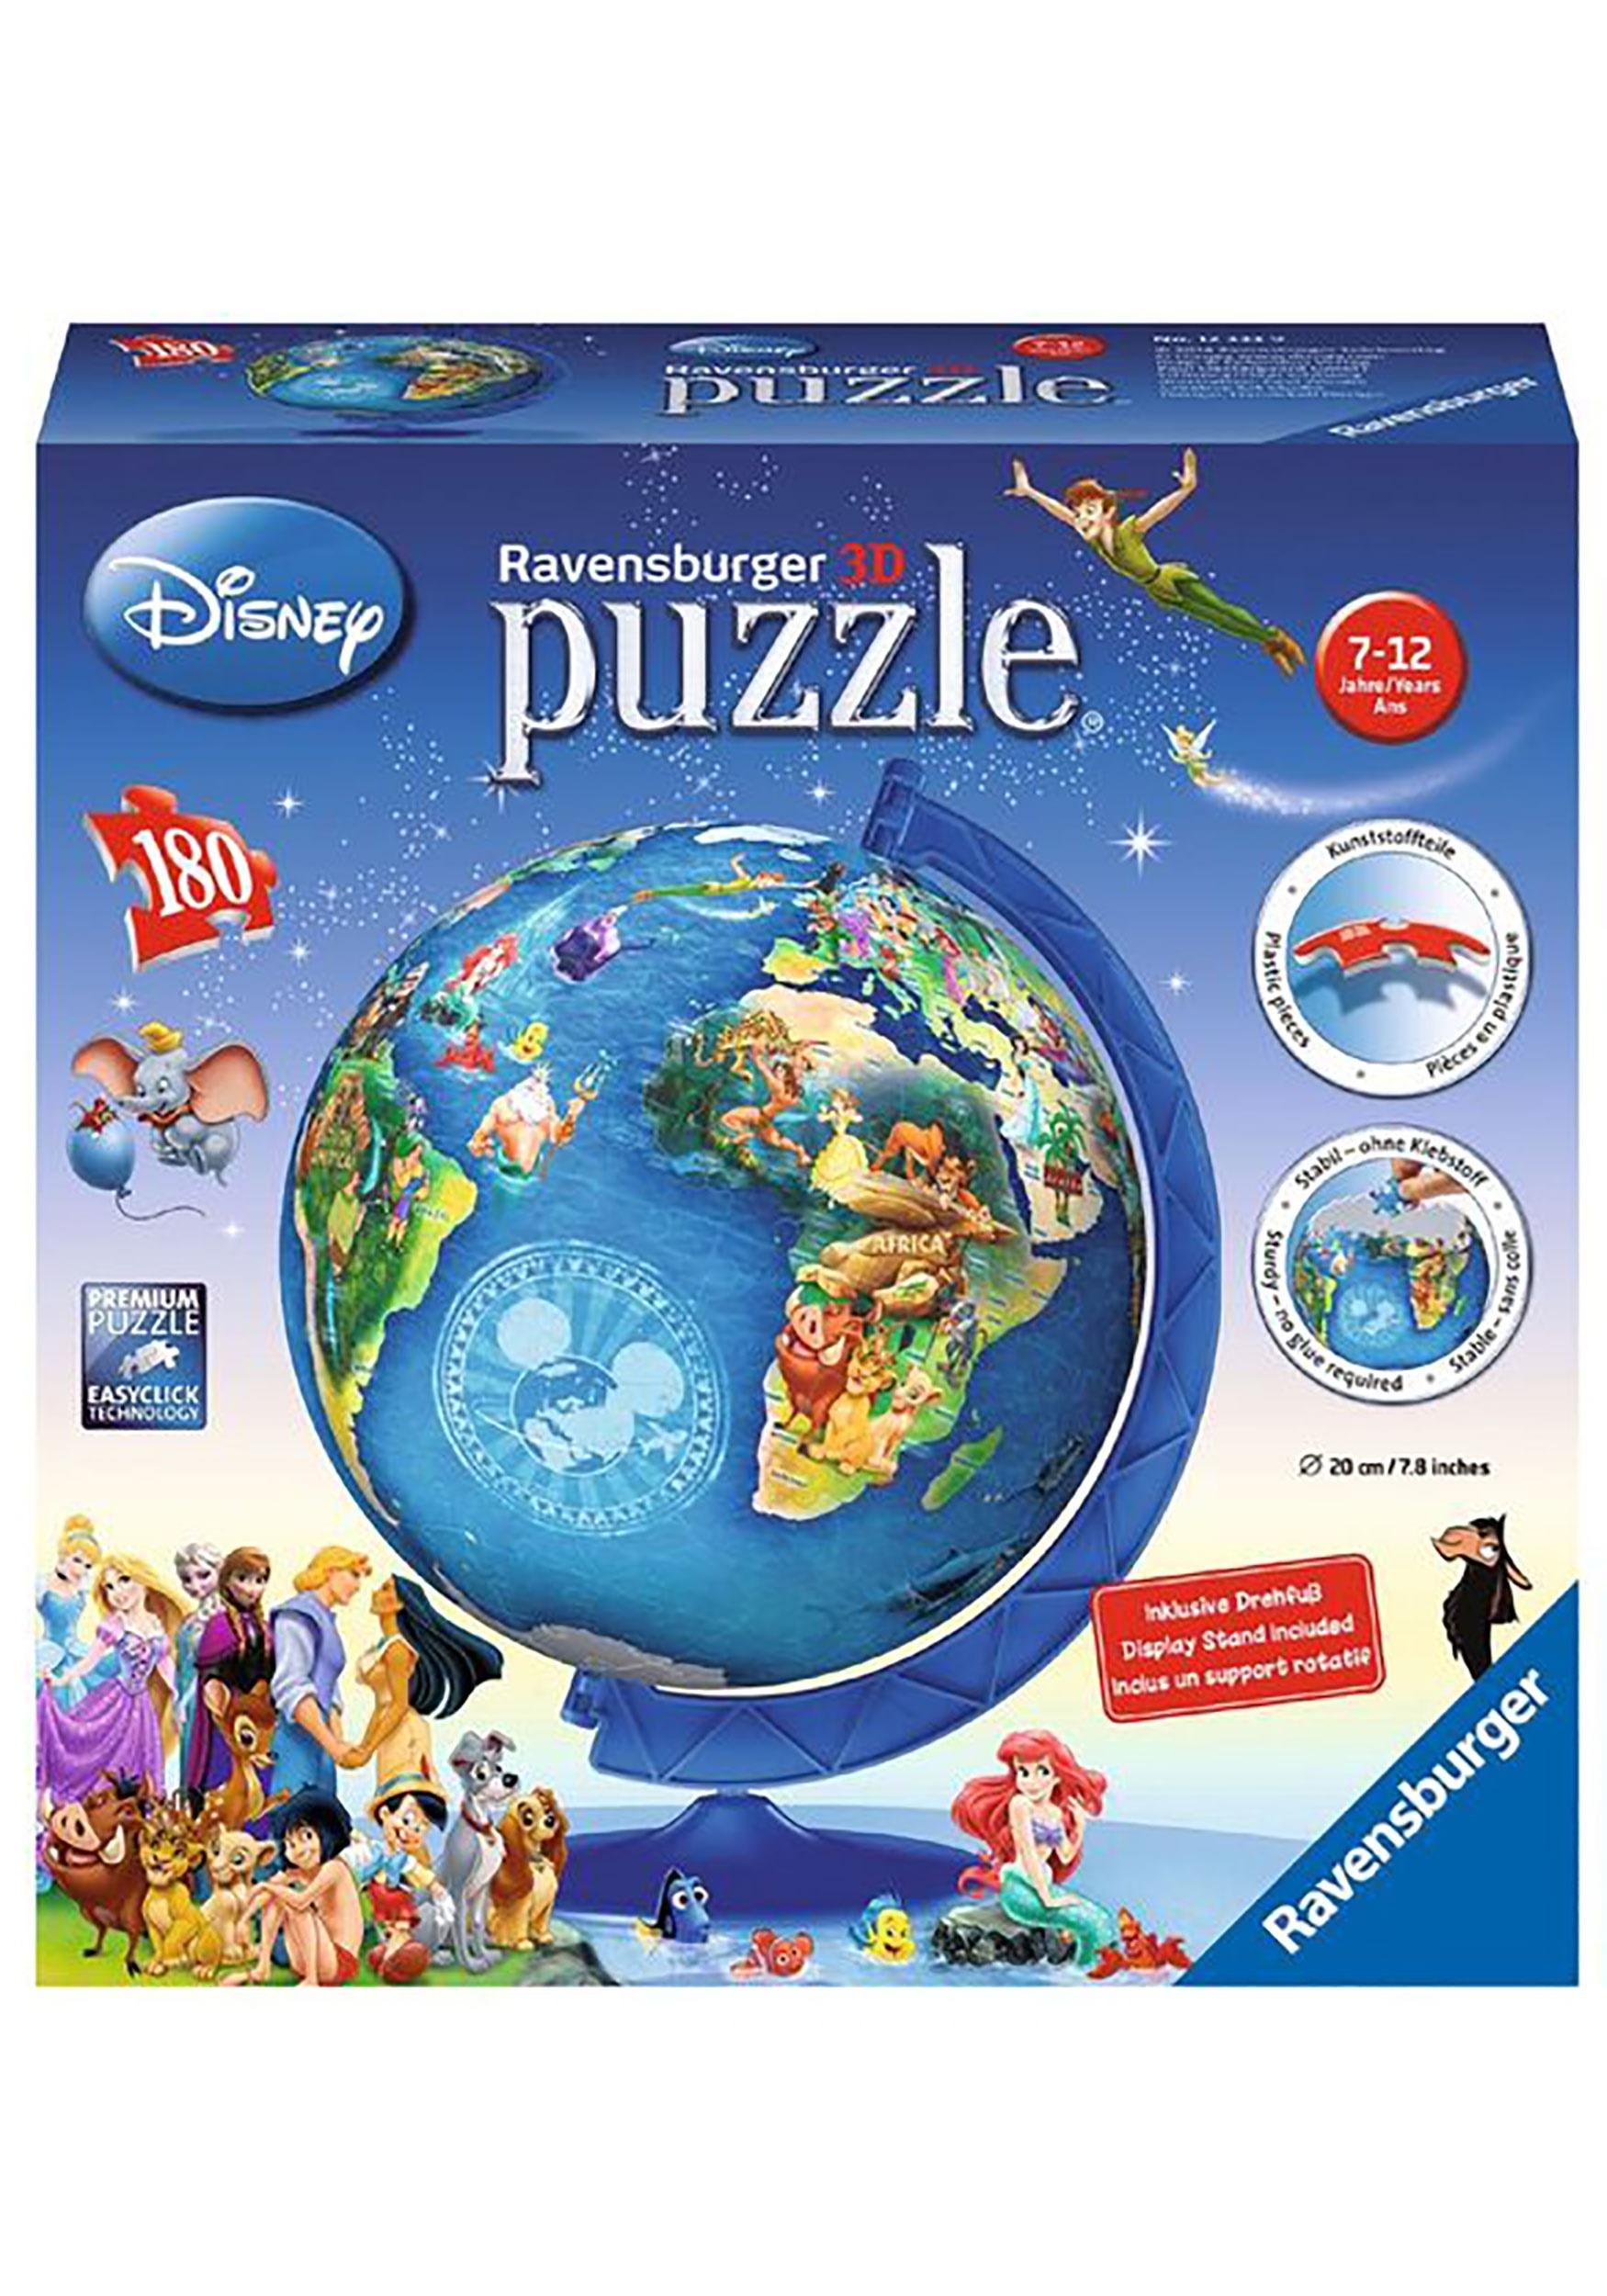 Disney Globe 180 pc 3D Puzzle